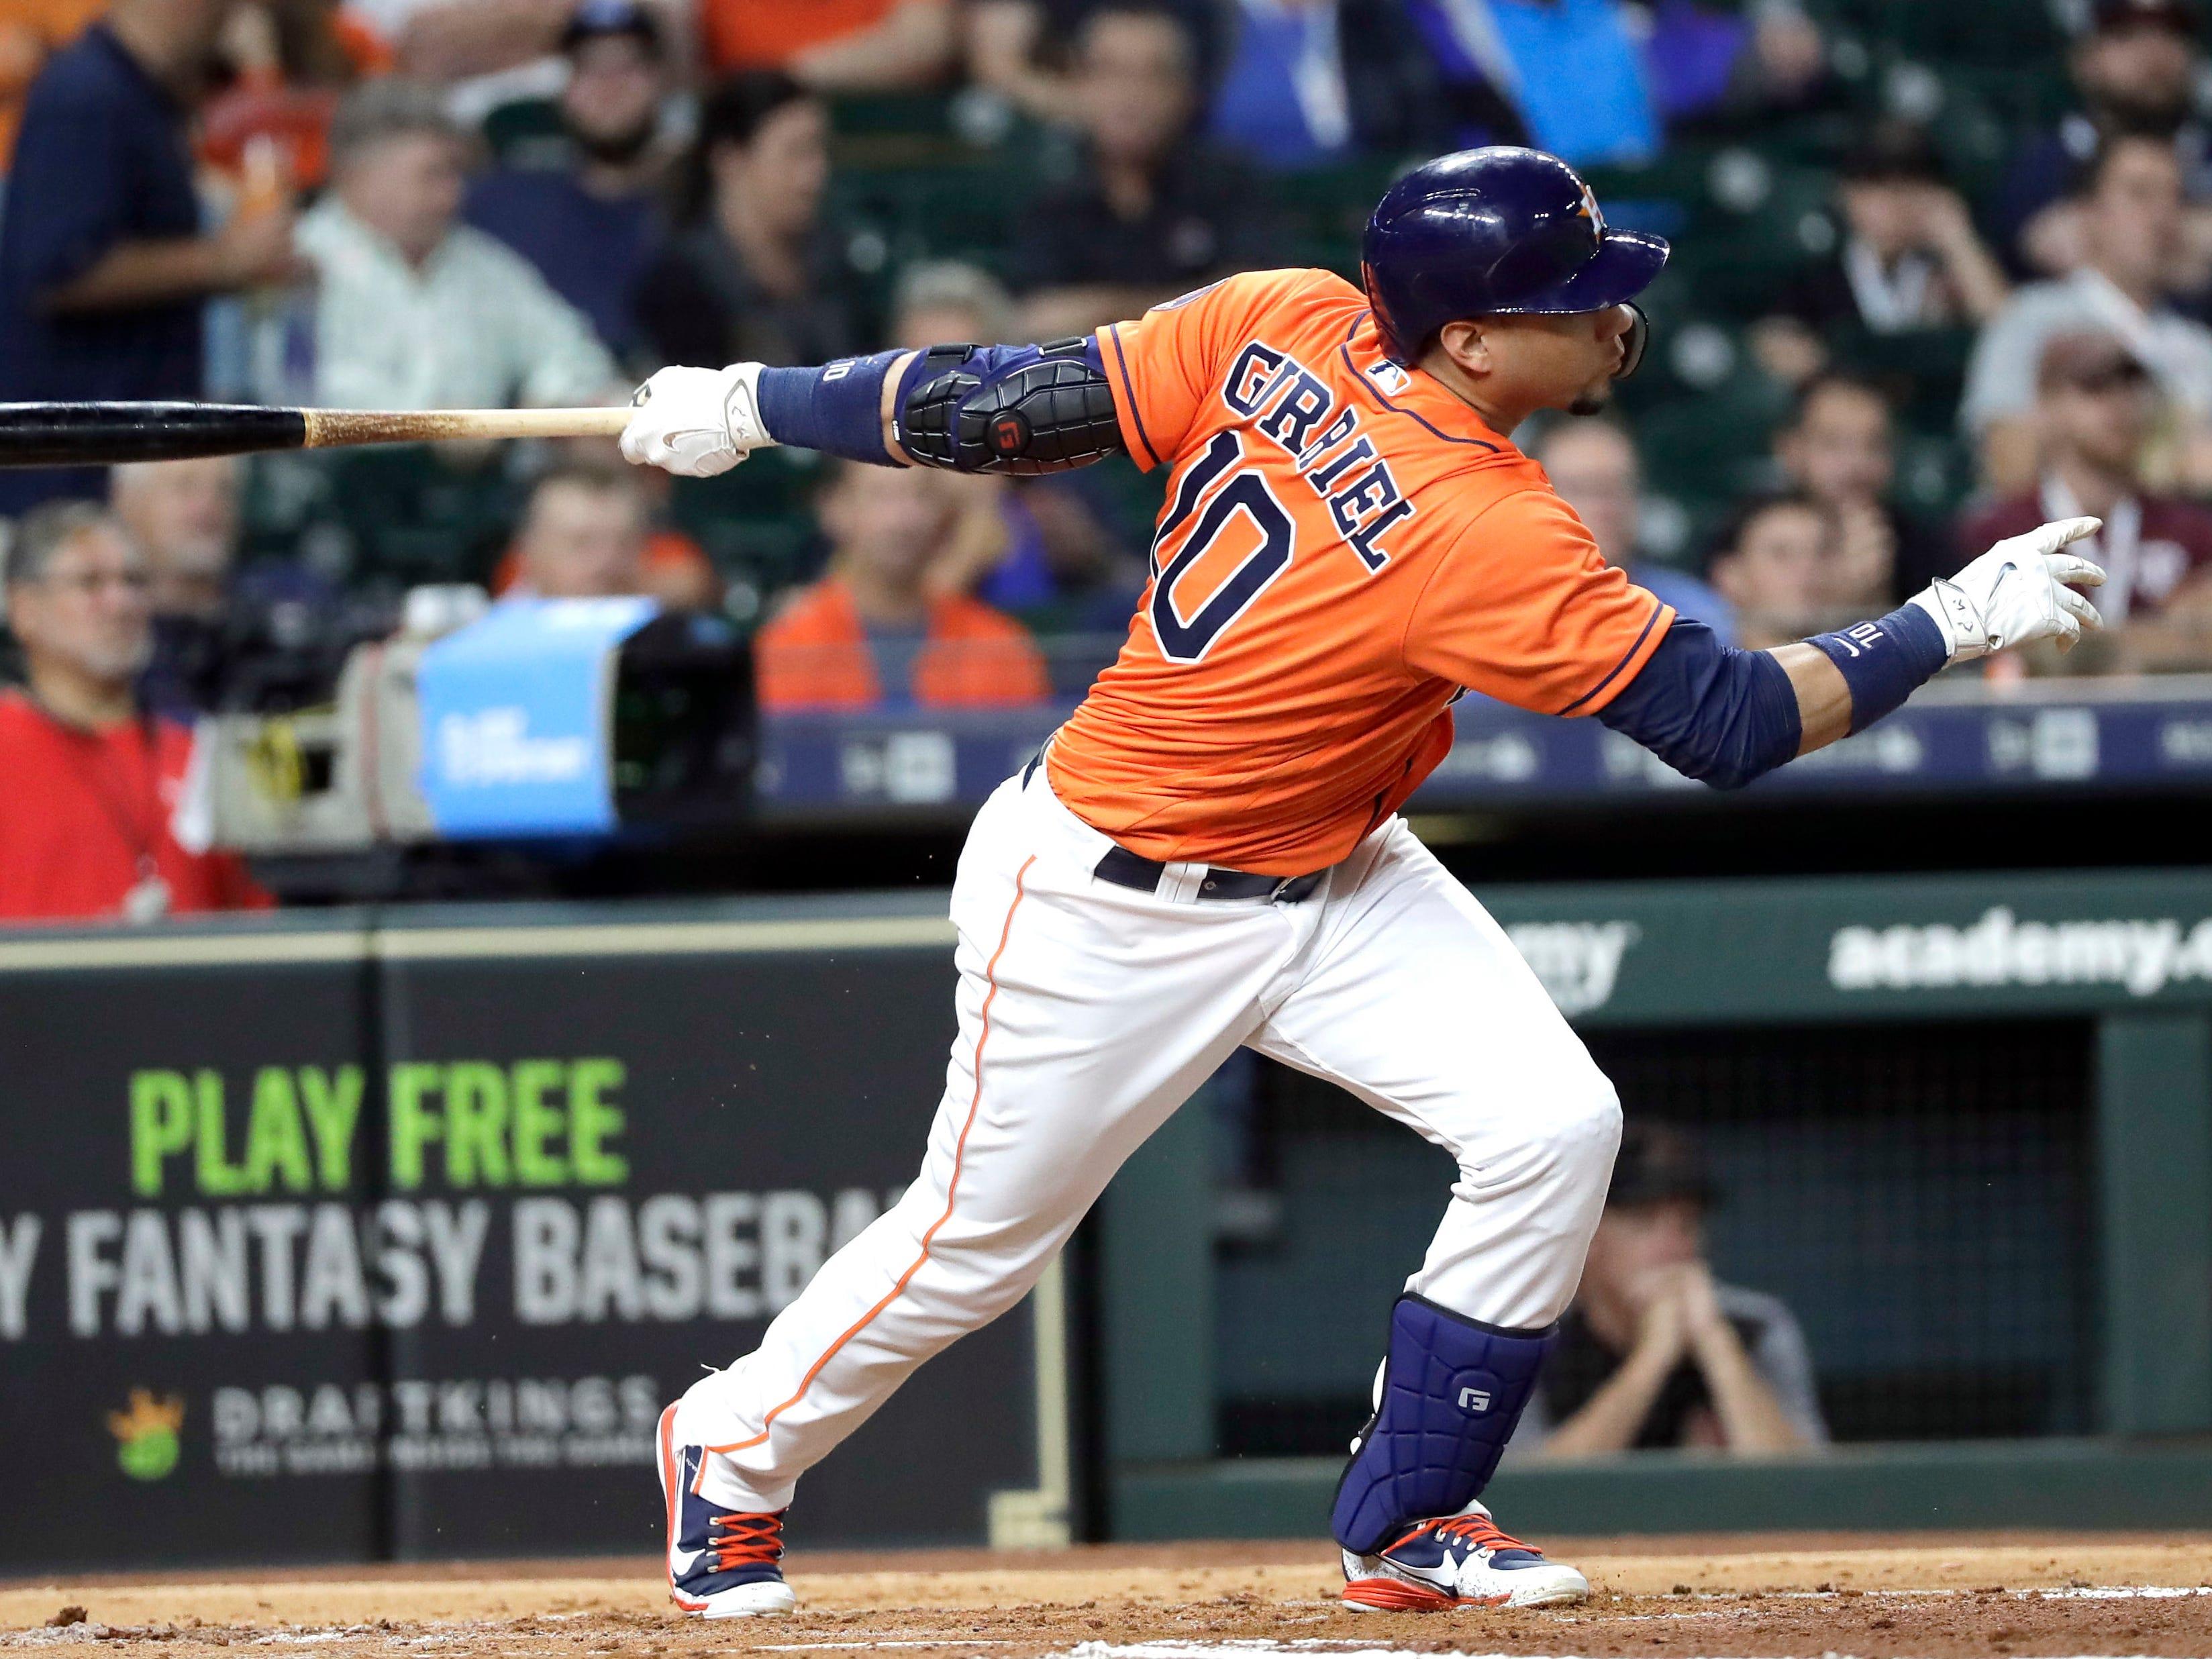 Houston Astros' Yuli Gurriel hits an RBI single against the Arizona Diamondbacks during the first inning of a baseball game Friday, Sept. 14, 2018, in Houston.